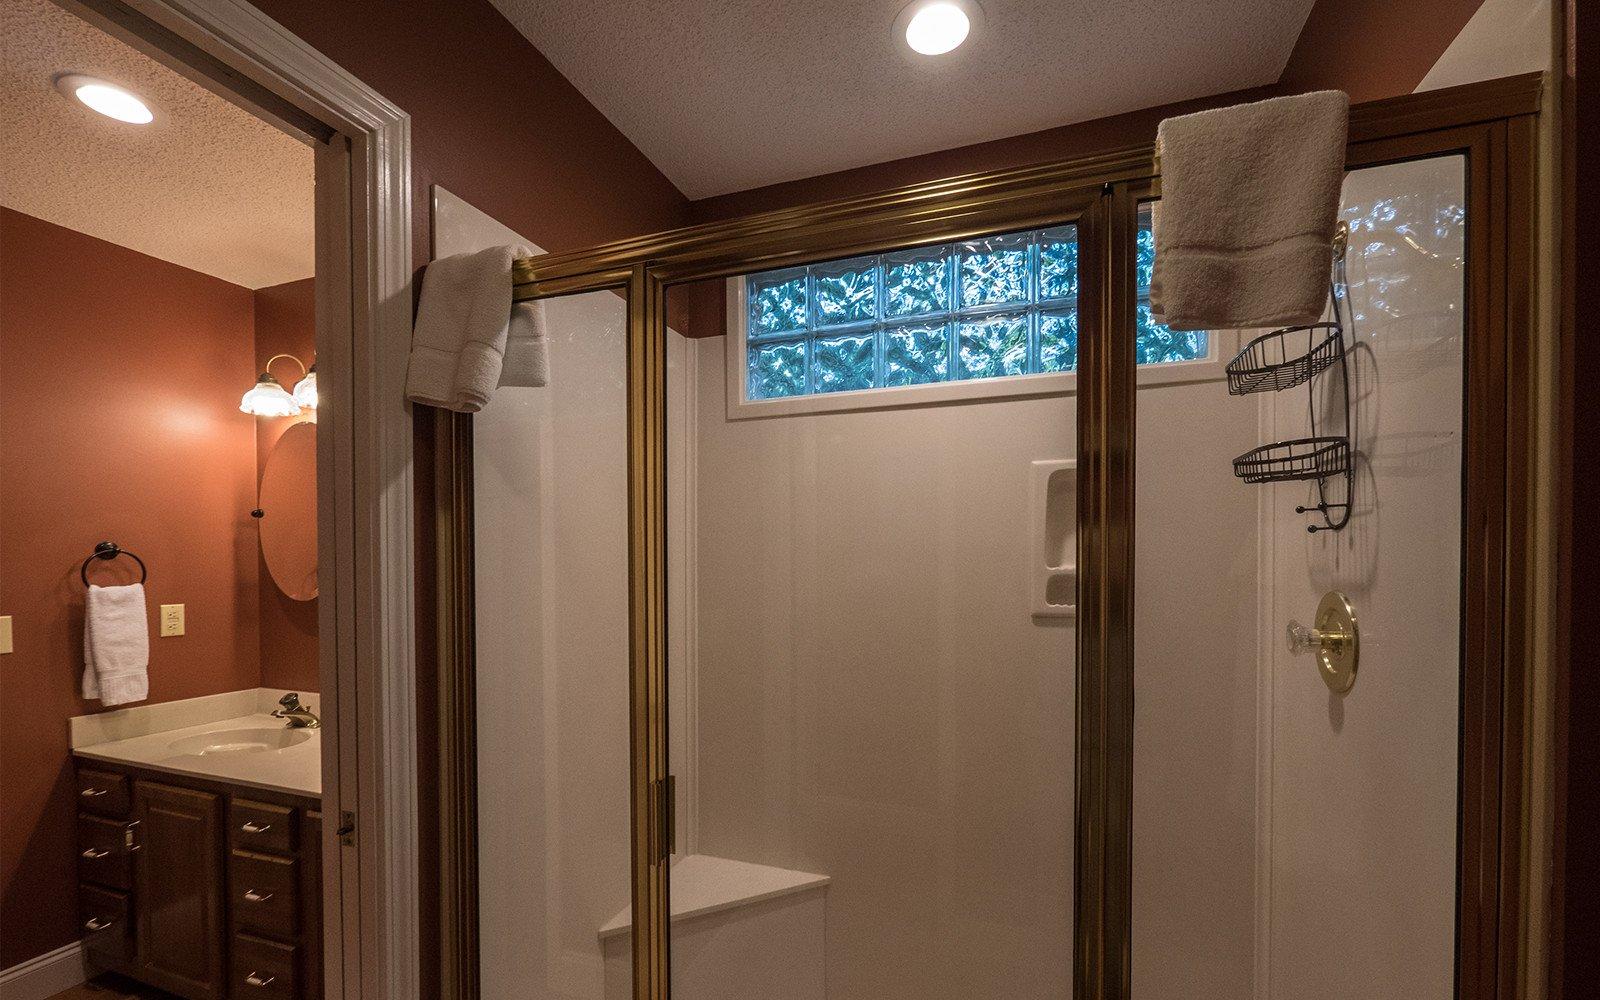 Hilt St house master bathroom